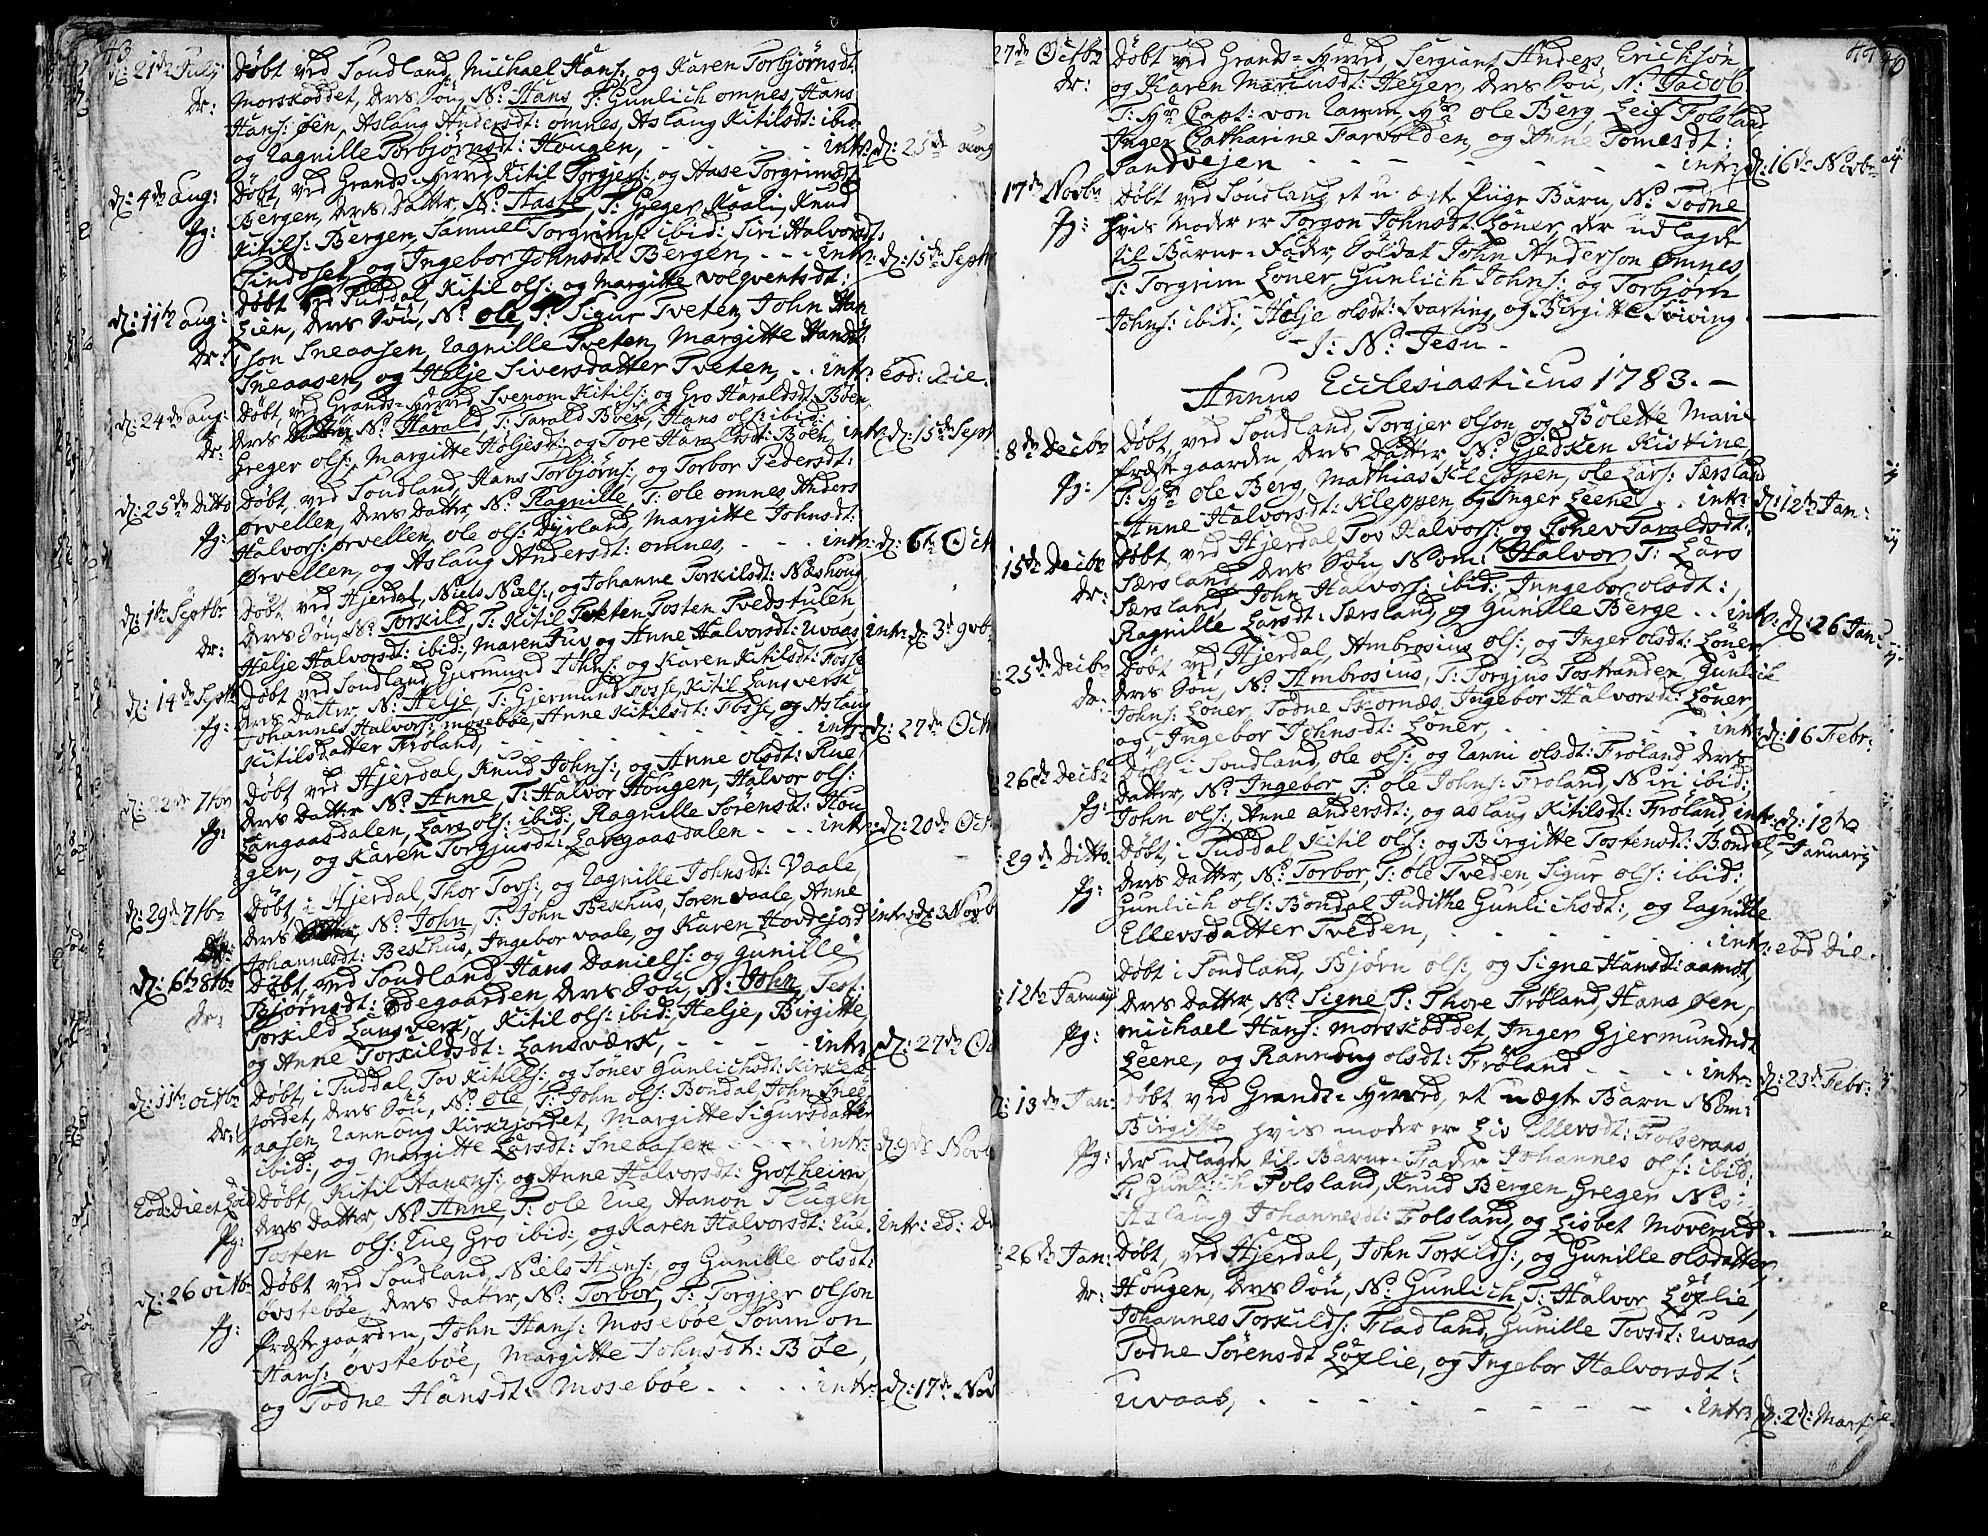 SAKO, Hjartdal kirkebøker, F/Fa/L0005: Ministerialbok nr. I 5, 1776-1801, s. 43-44